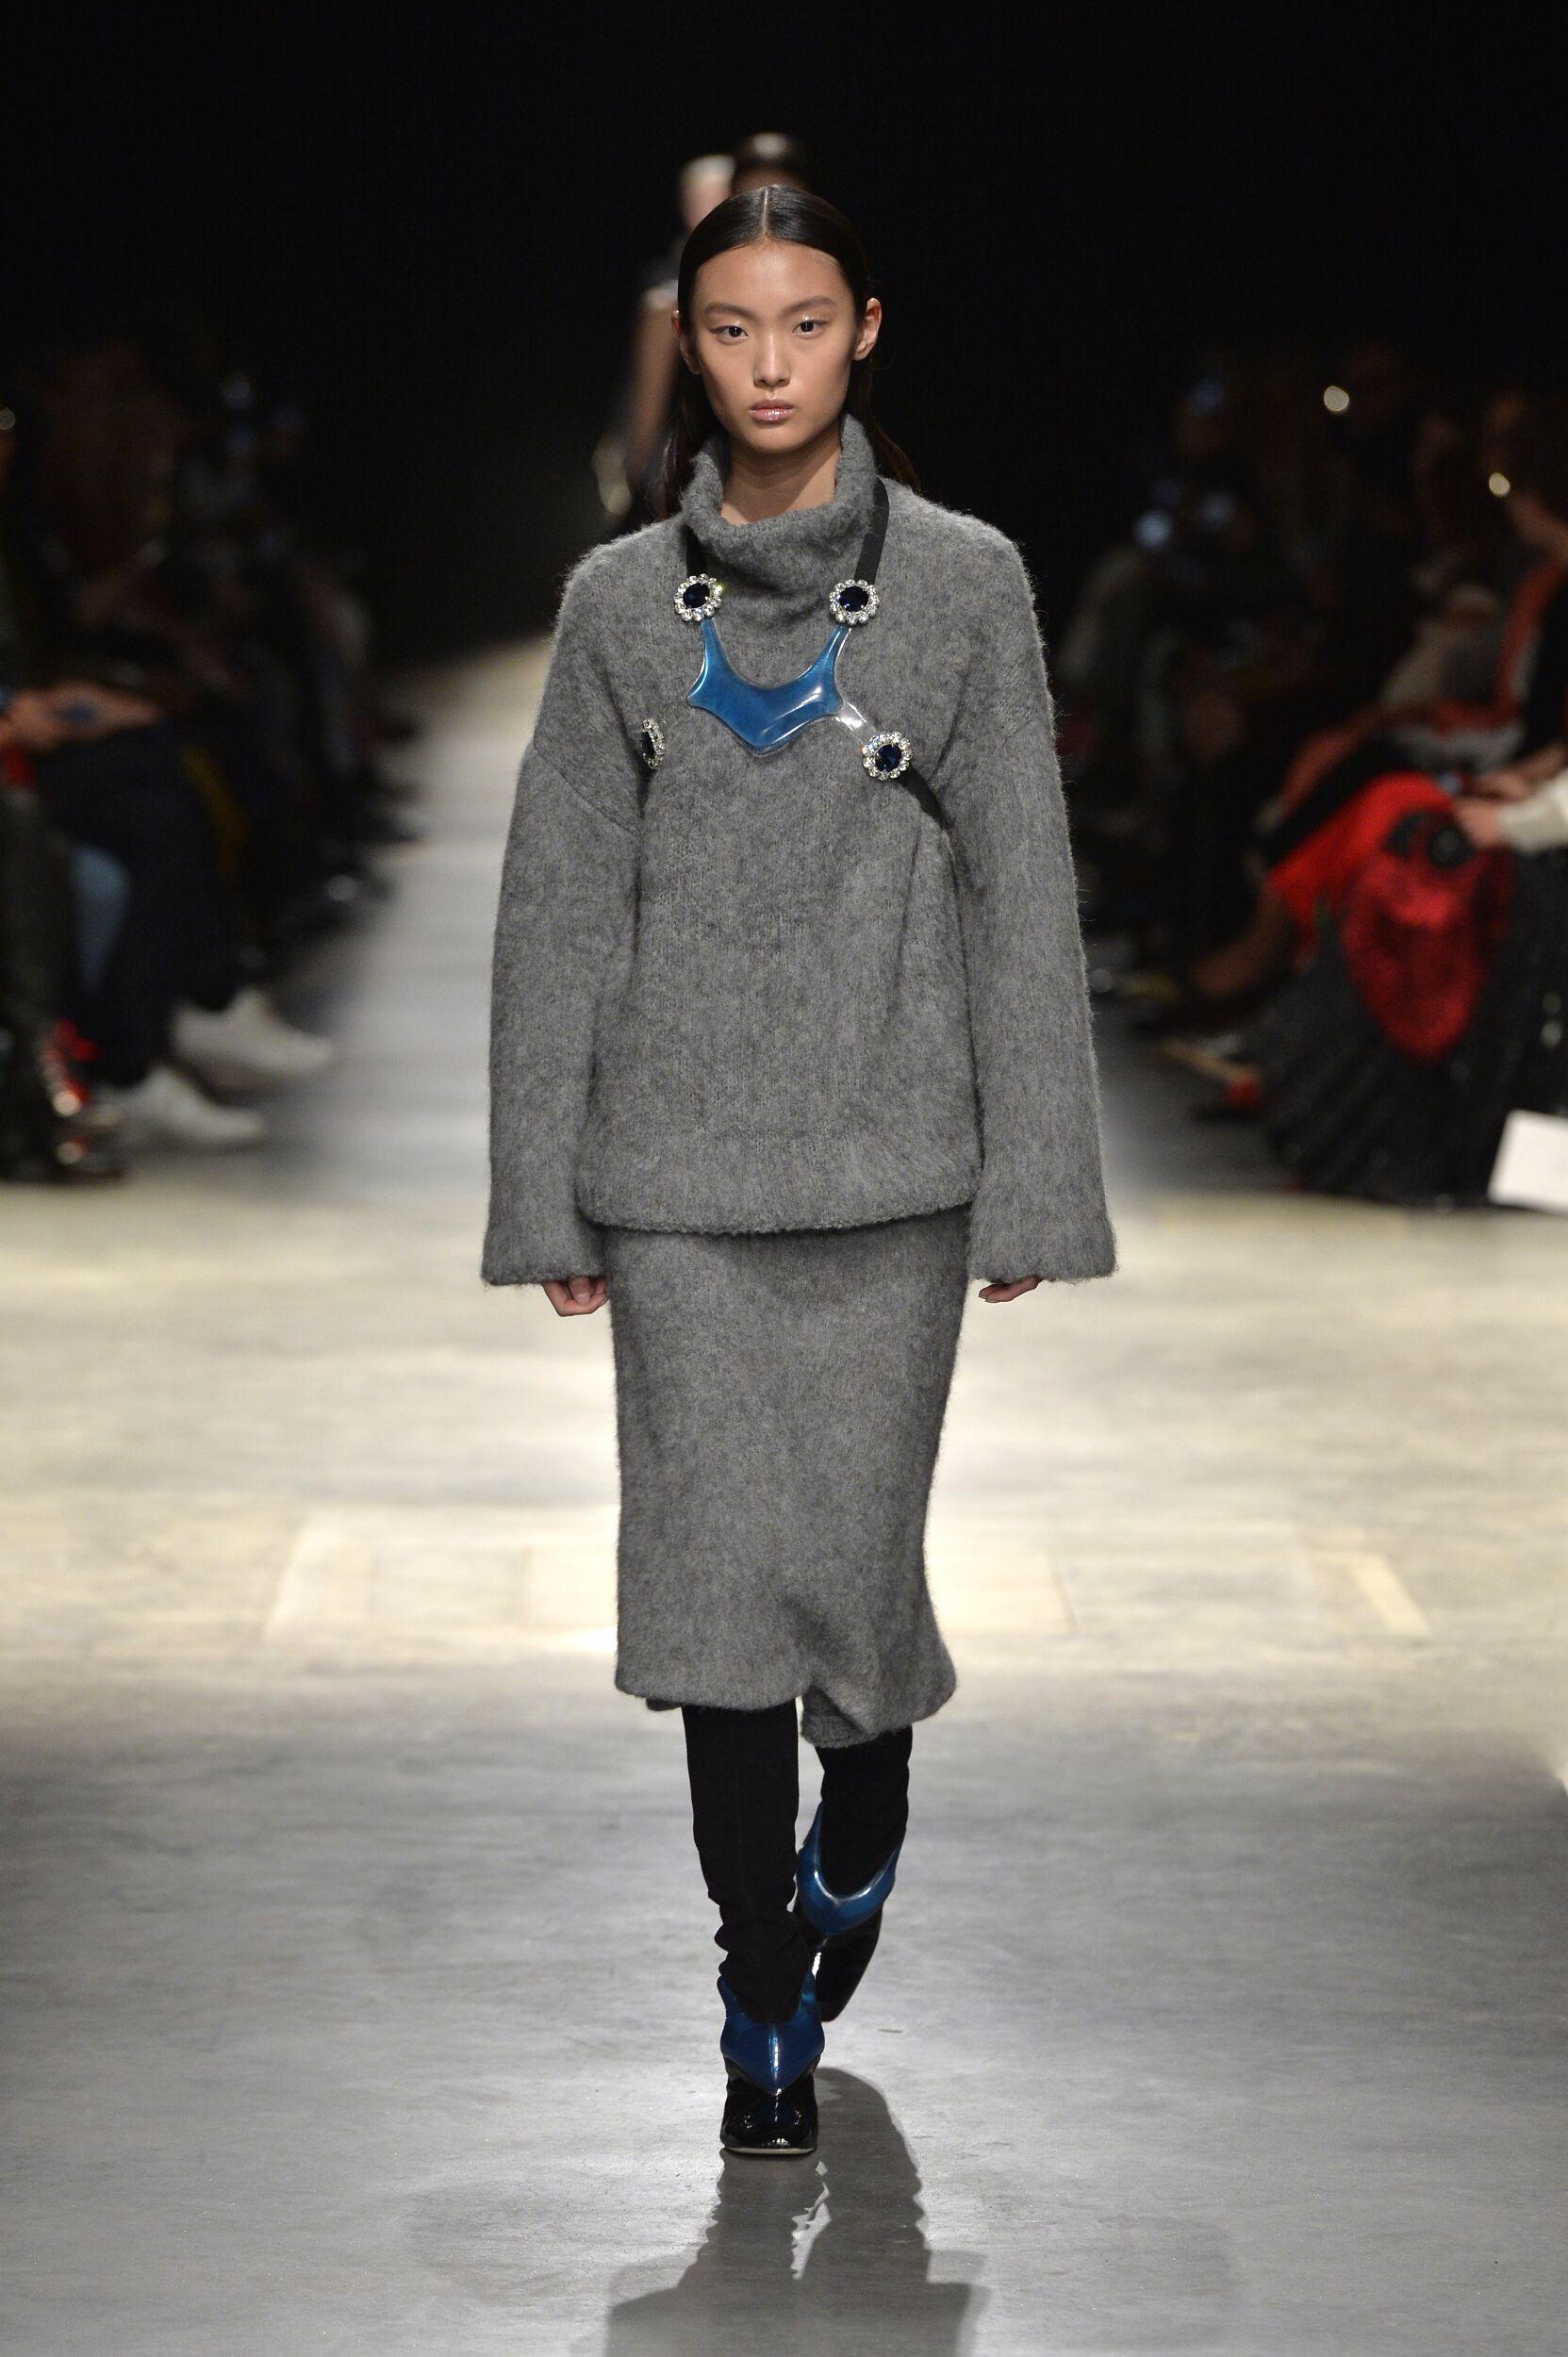 Catwalk Christopher Kane Woman Fashion Show Winter 2020